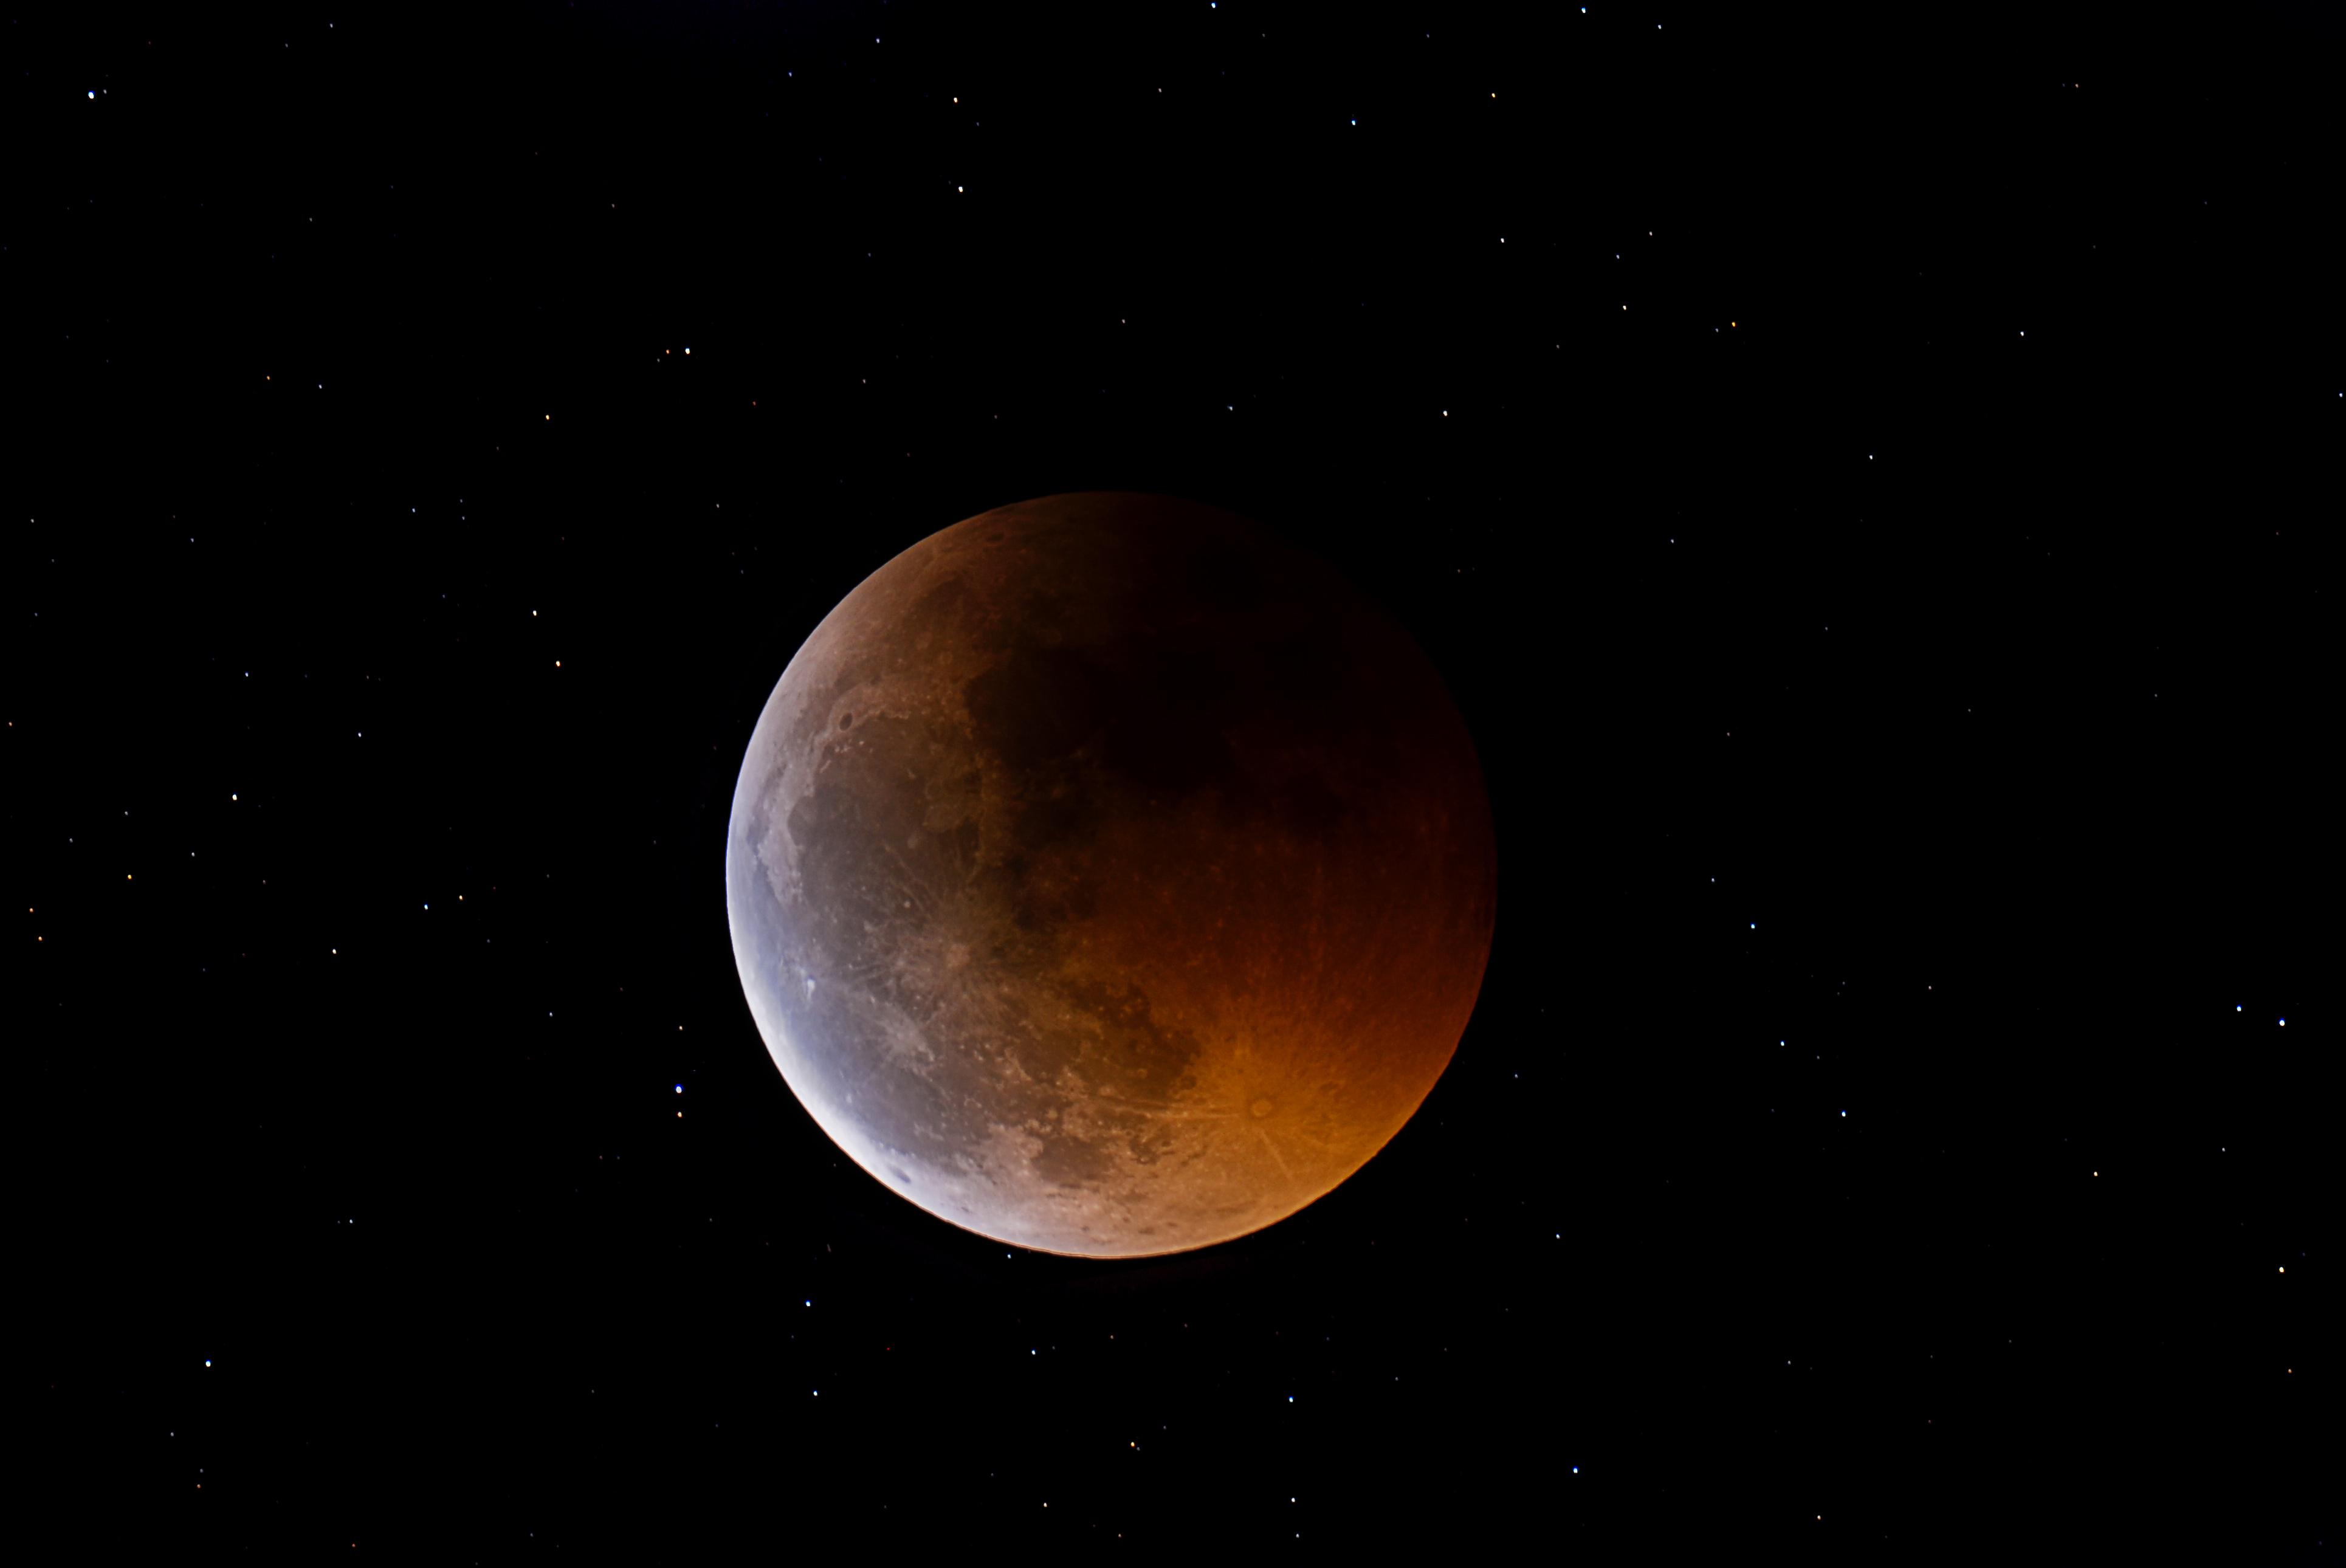 Foto gran tamaño de la luna